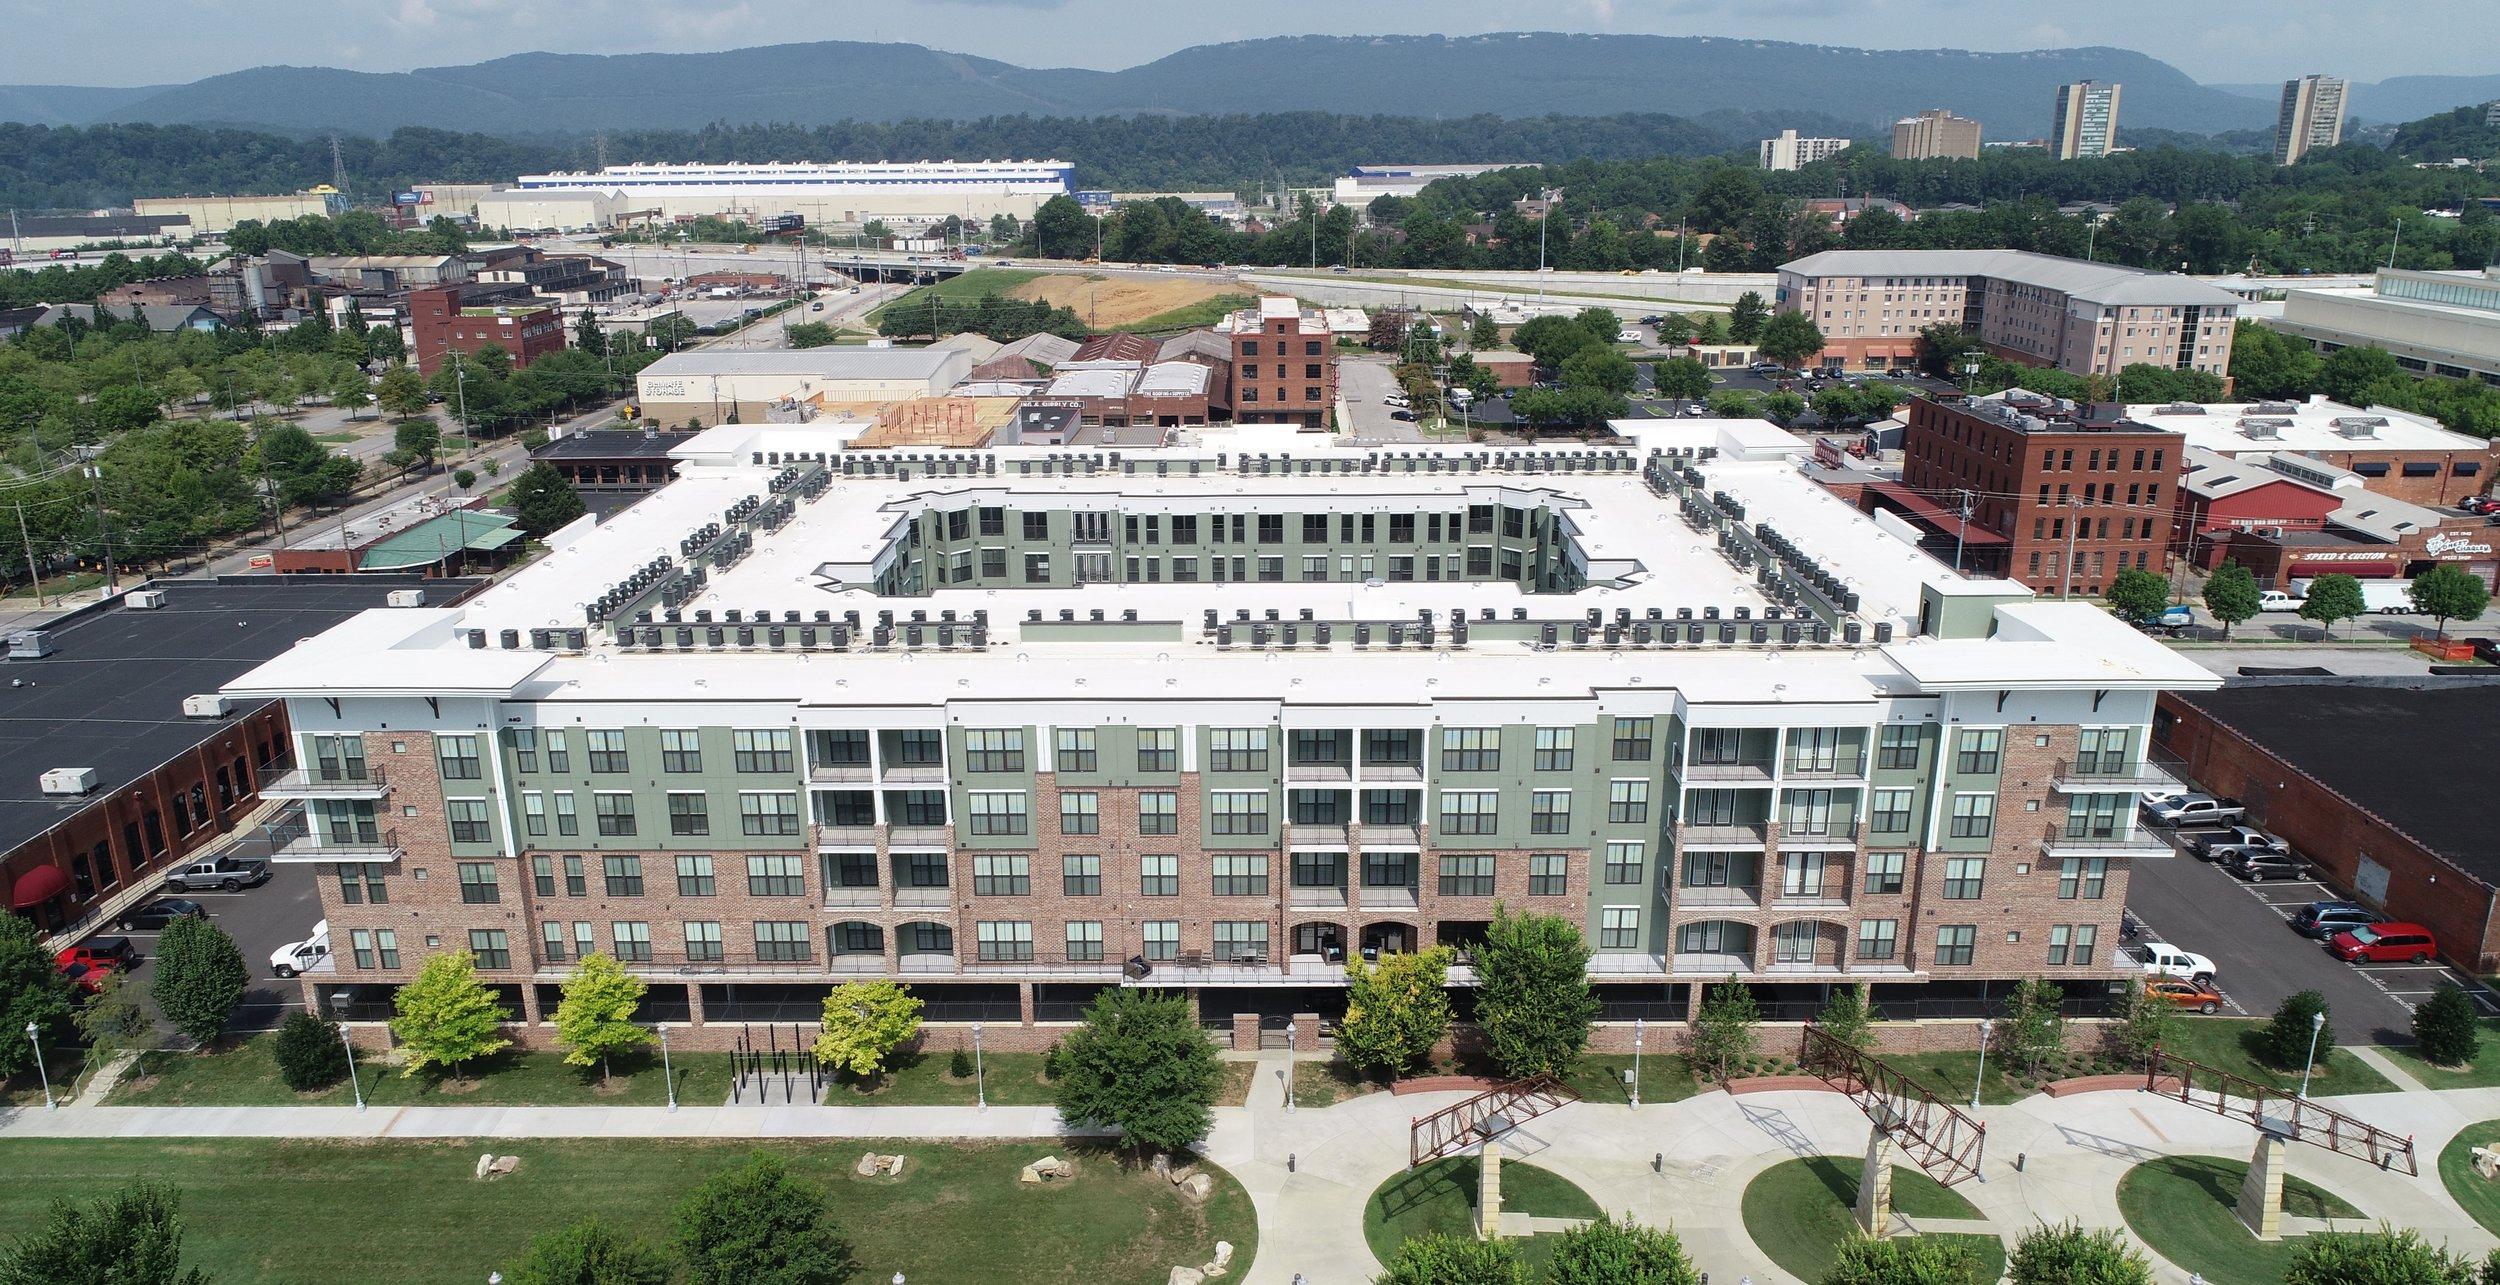 1400 Chestnut Apartments